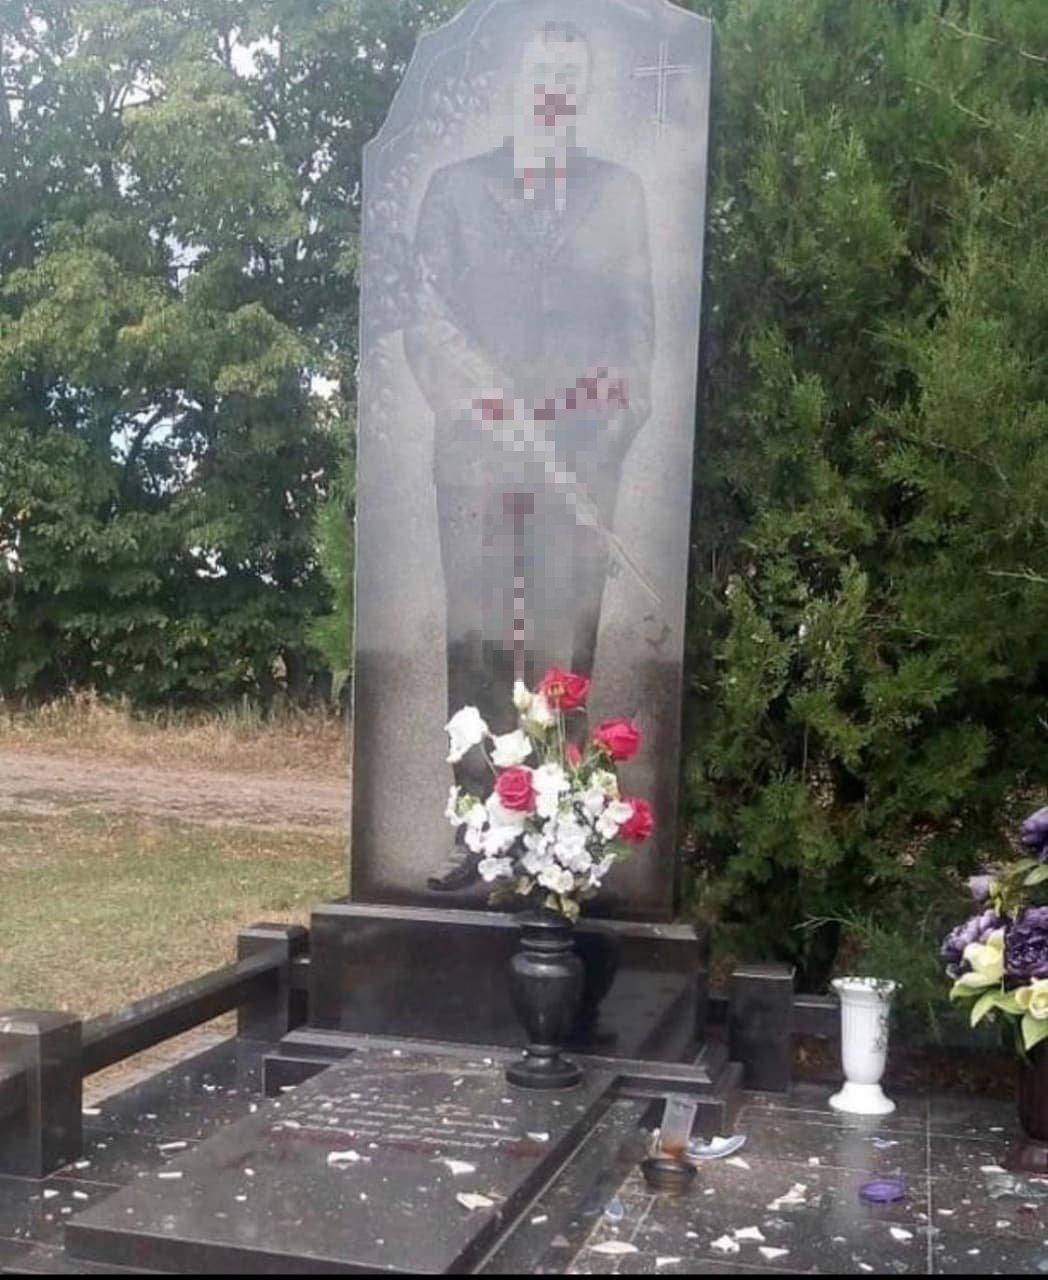 На Харьковщине подростки разрисовали надгробия и сняли на кладбище видео в «TikTok»: полиция проводит проверку, - ФОТО, фото-1